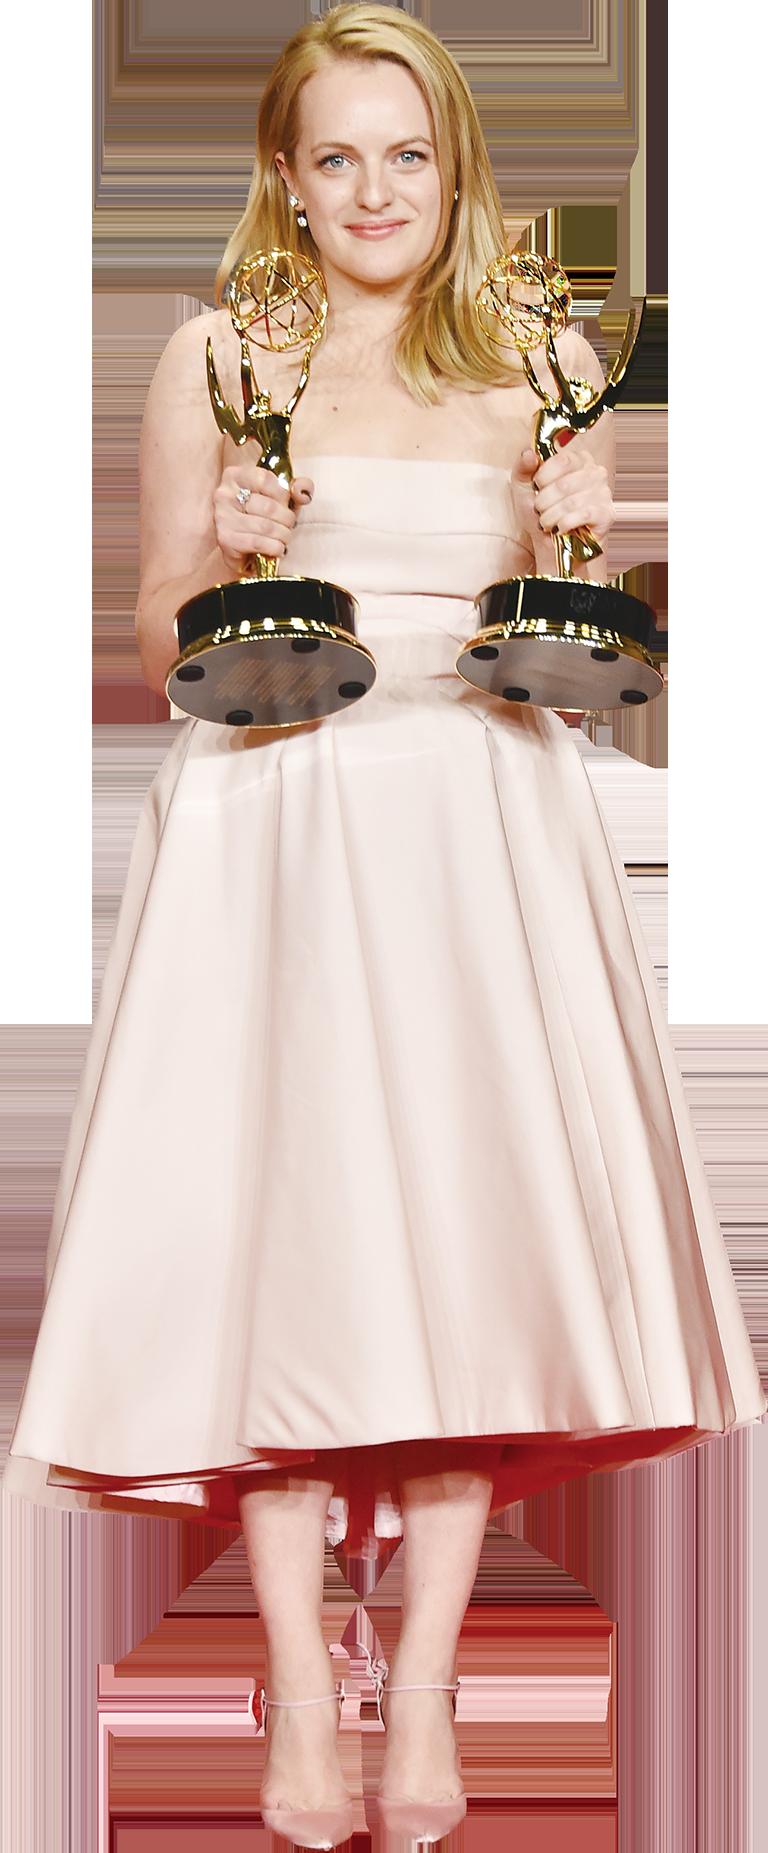 伊莉莎白摩斯(Elisabeth Moss)憑《The Handmaid's Tale》劇首次封艾美視后。(Getty Images)